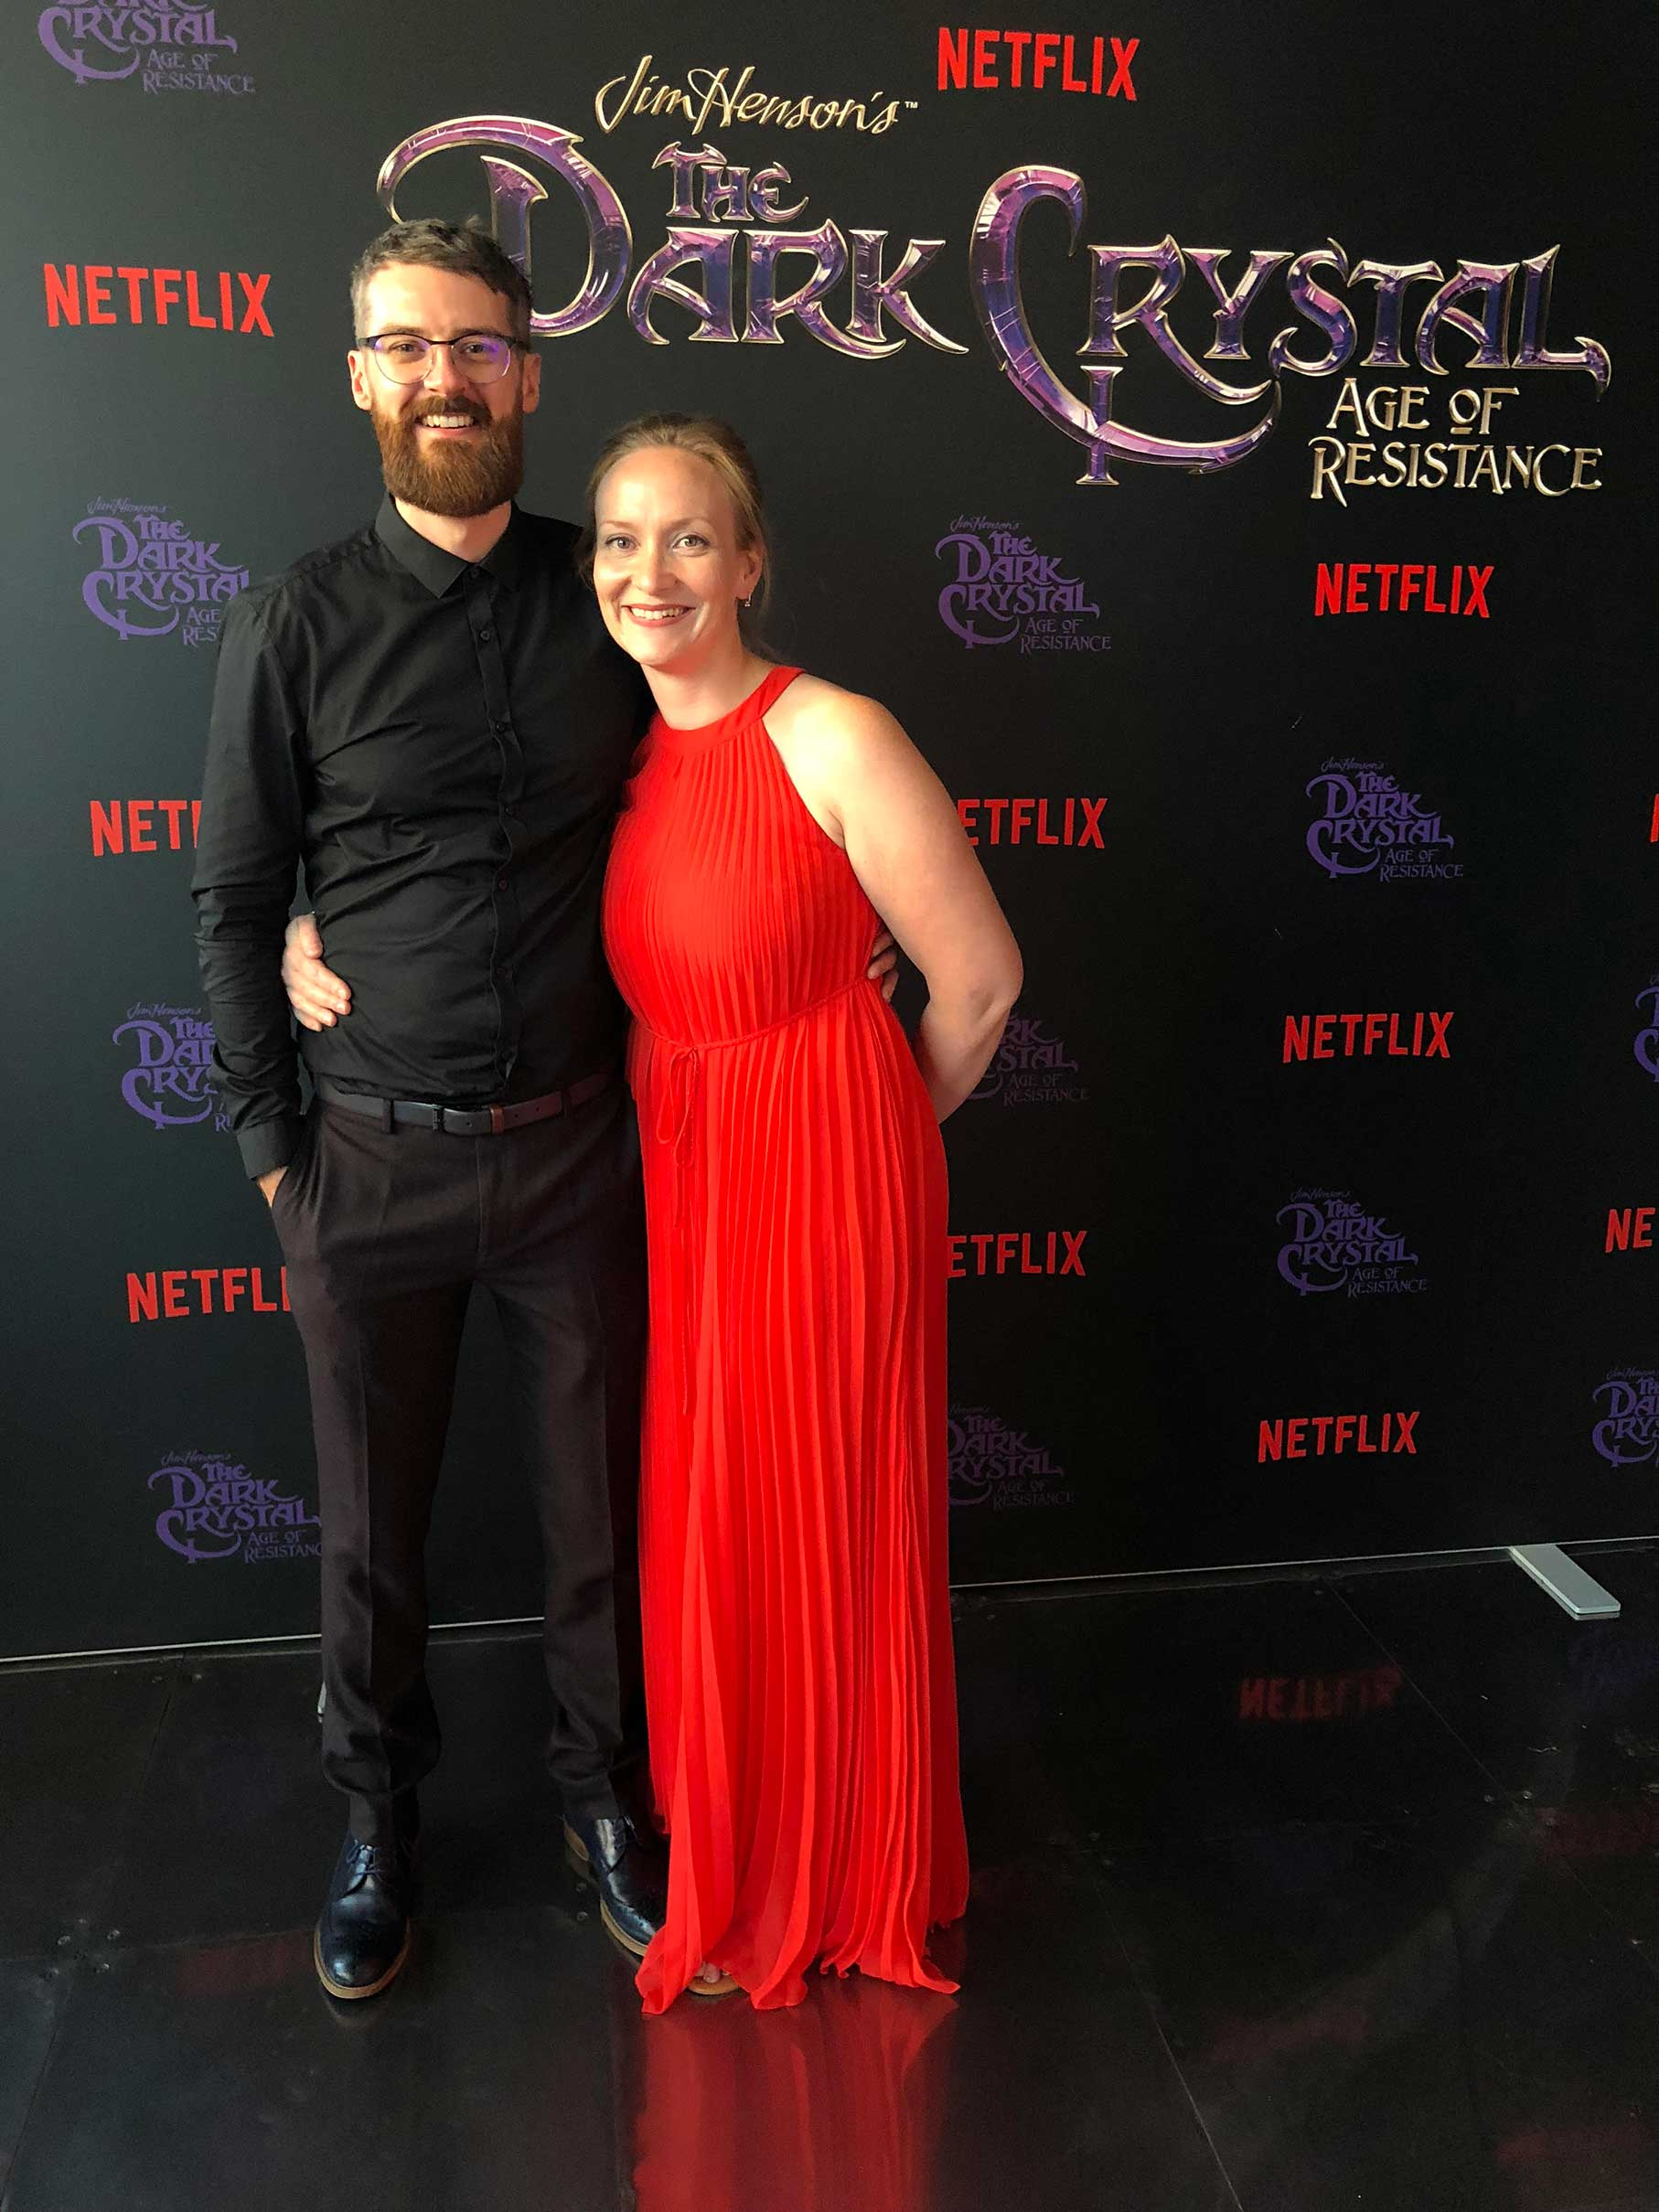 Jim Hensons Dark Crystal, Netflix